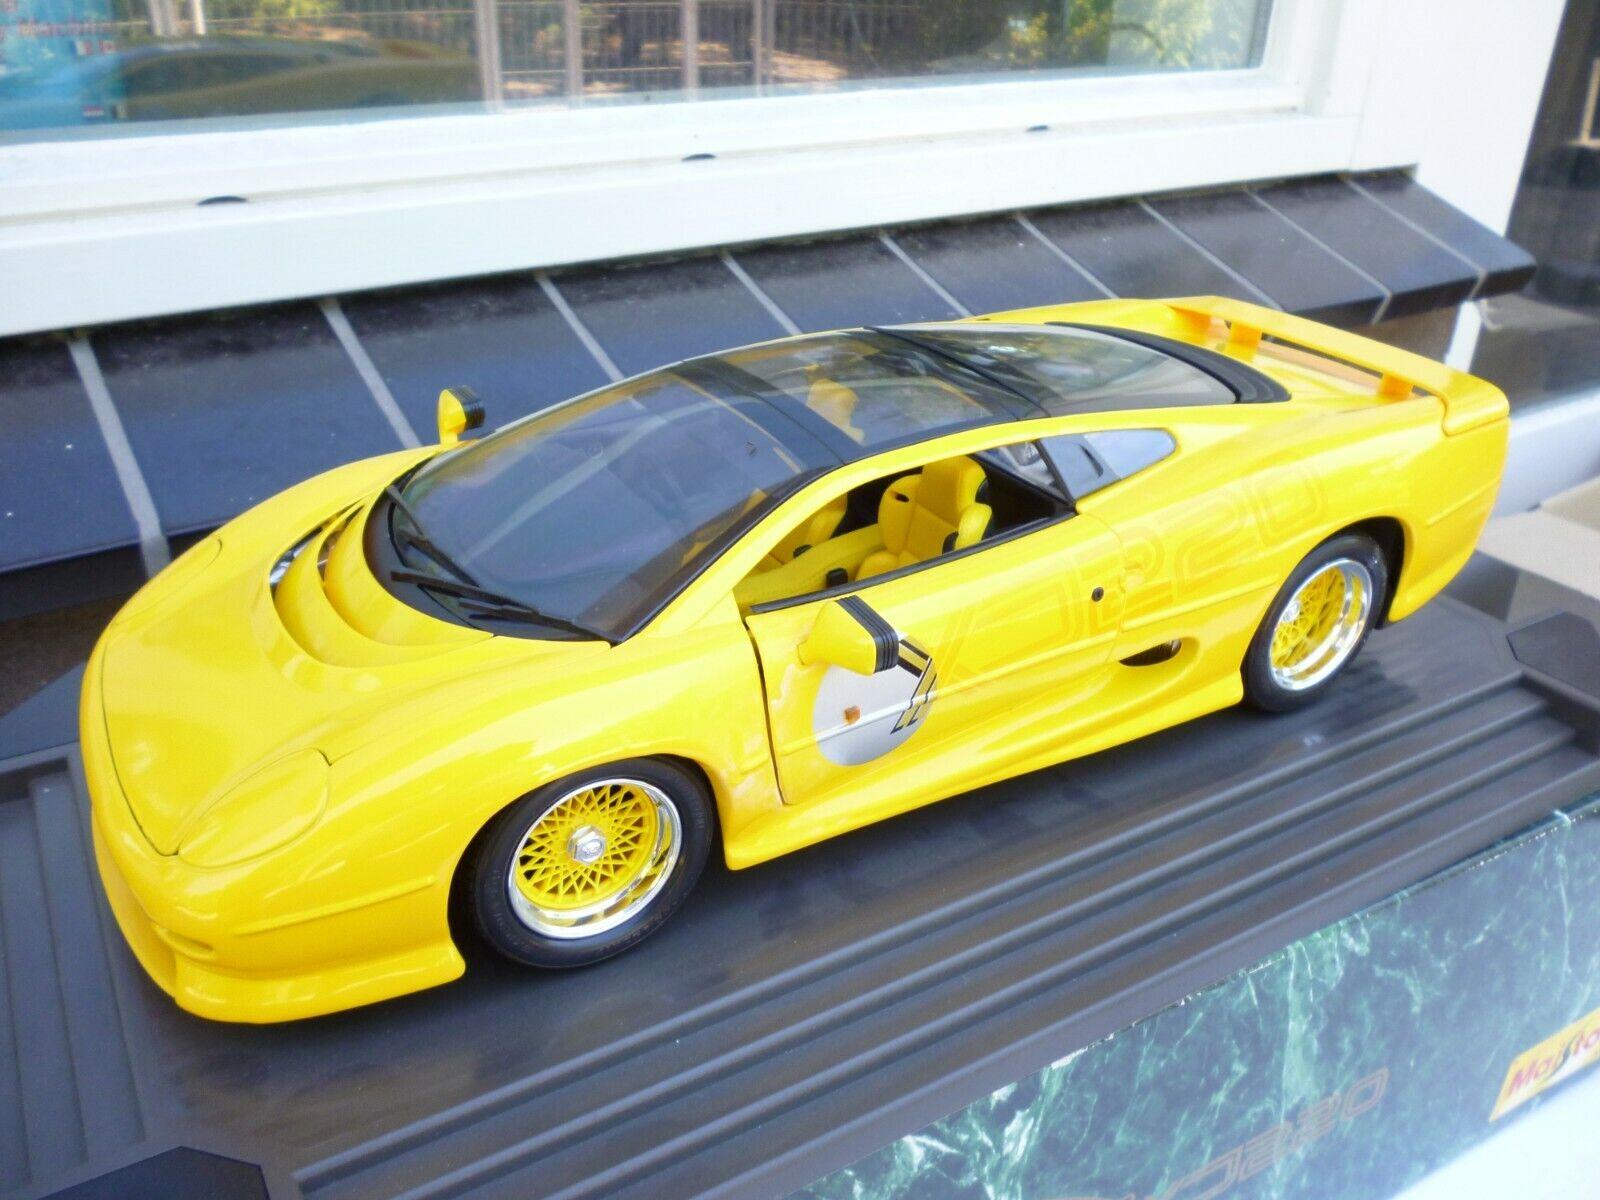 punto de venta de la marca (MAISTO) 1 12 SCALE JAGUAR XJ220 amarillo Racing    BBS   RECocheO  Coche (RARE  NM BOX  autorización oficial